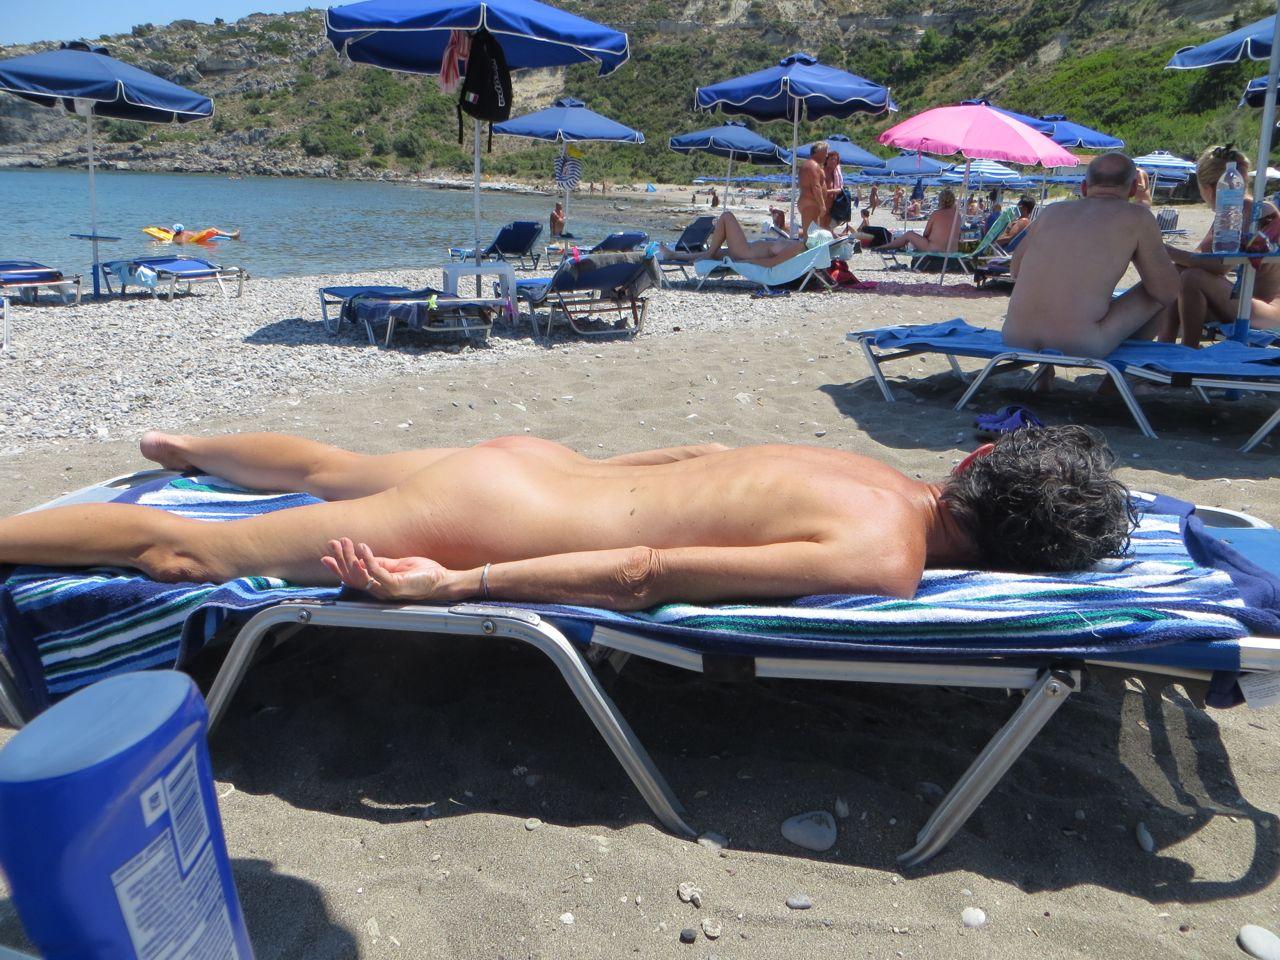 rhodes nudist beach